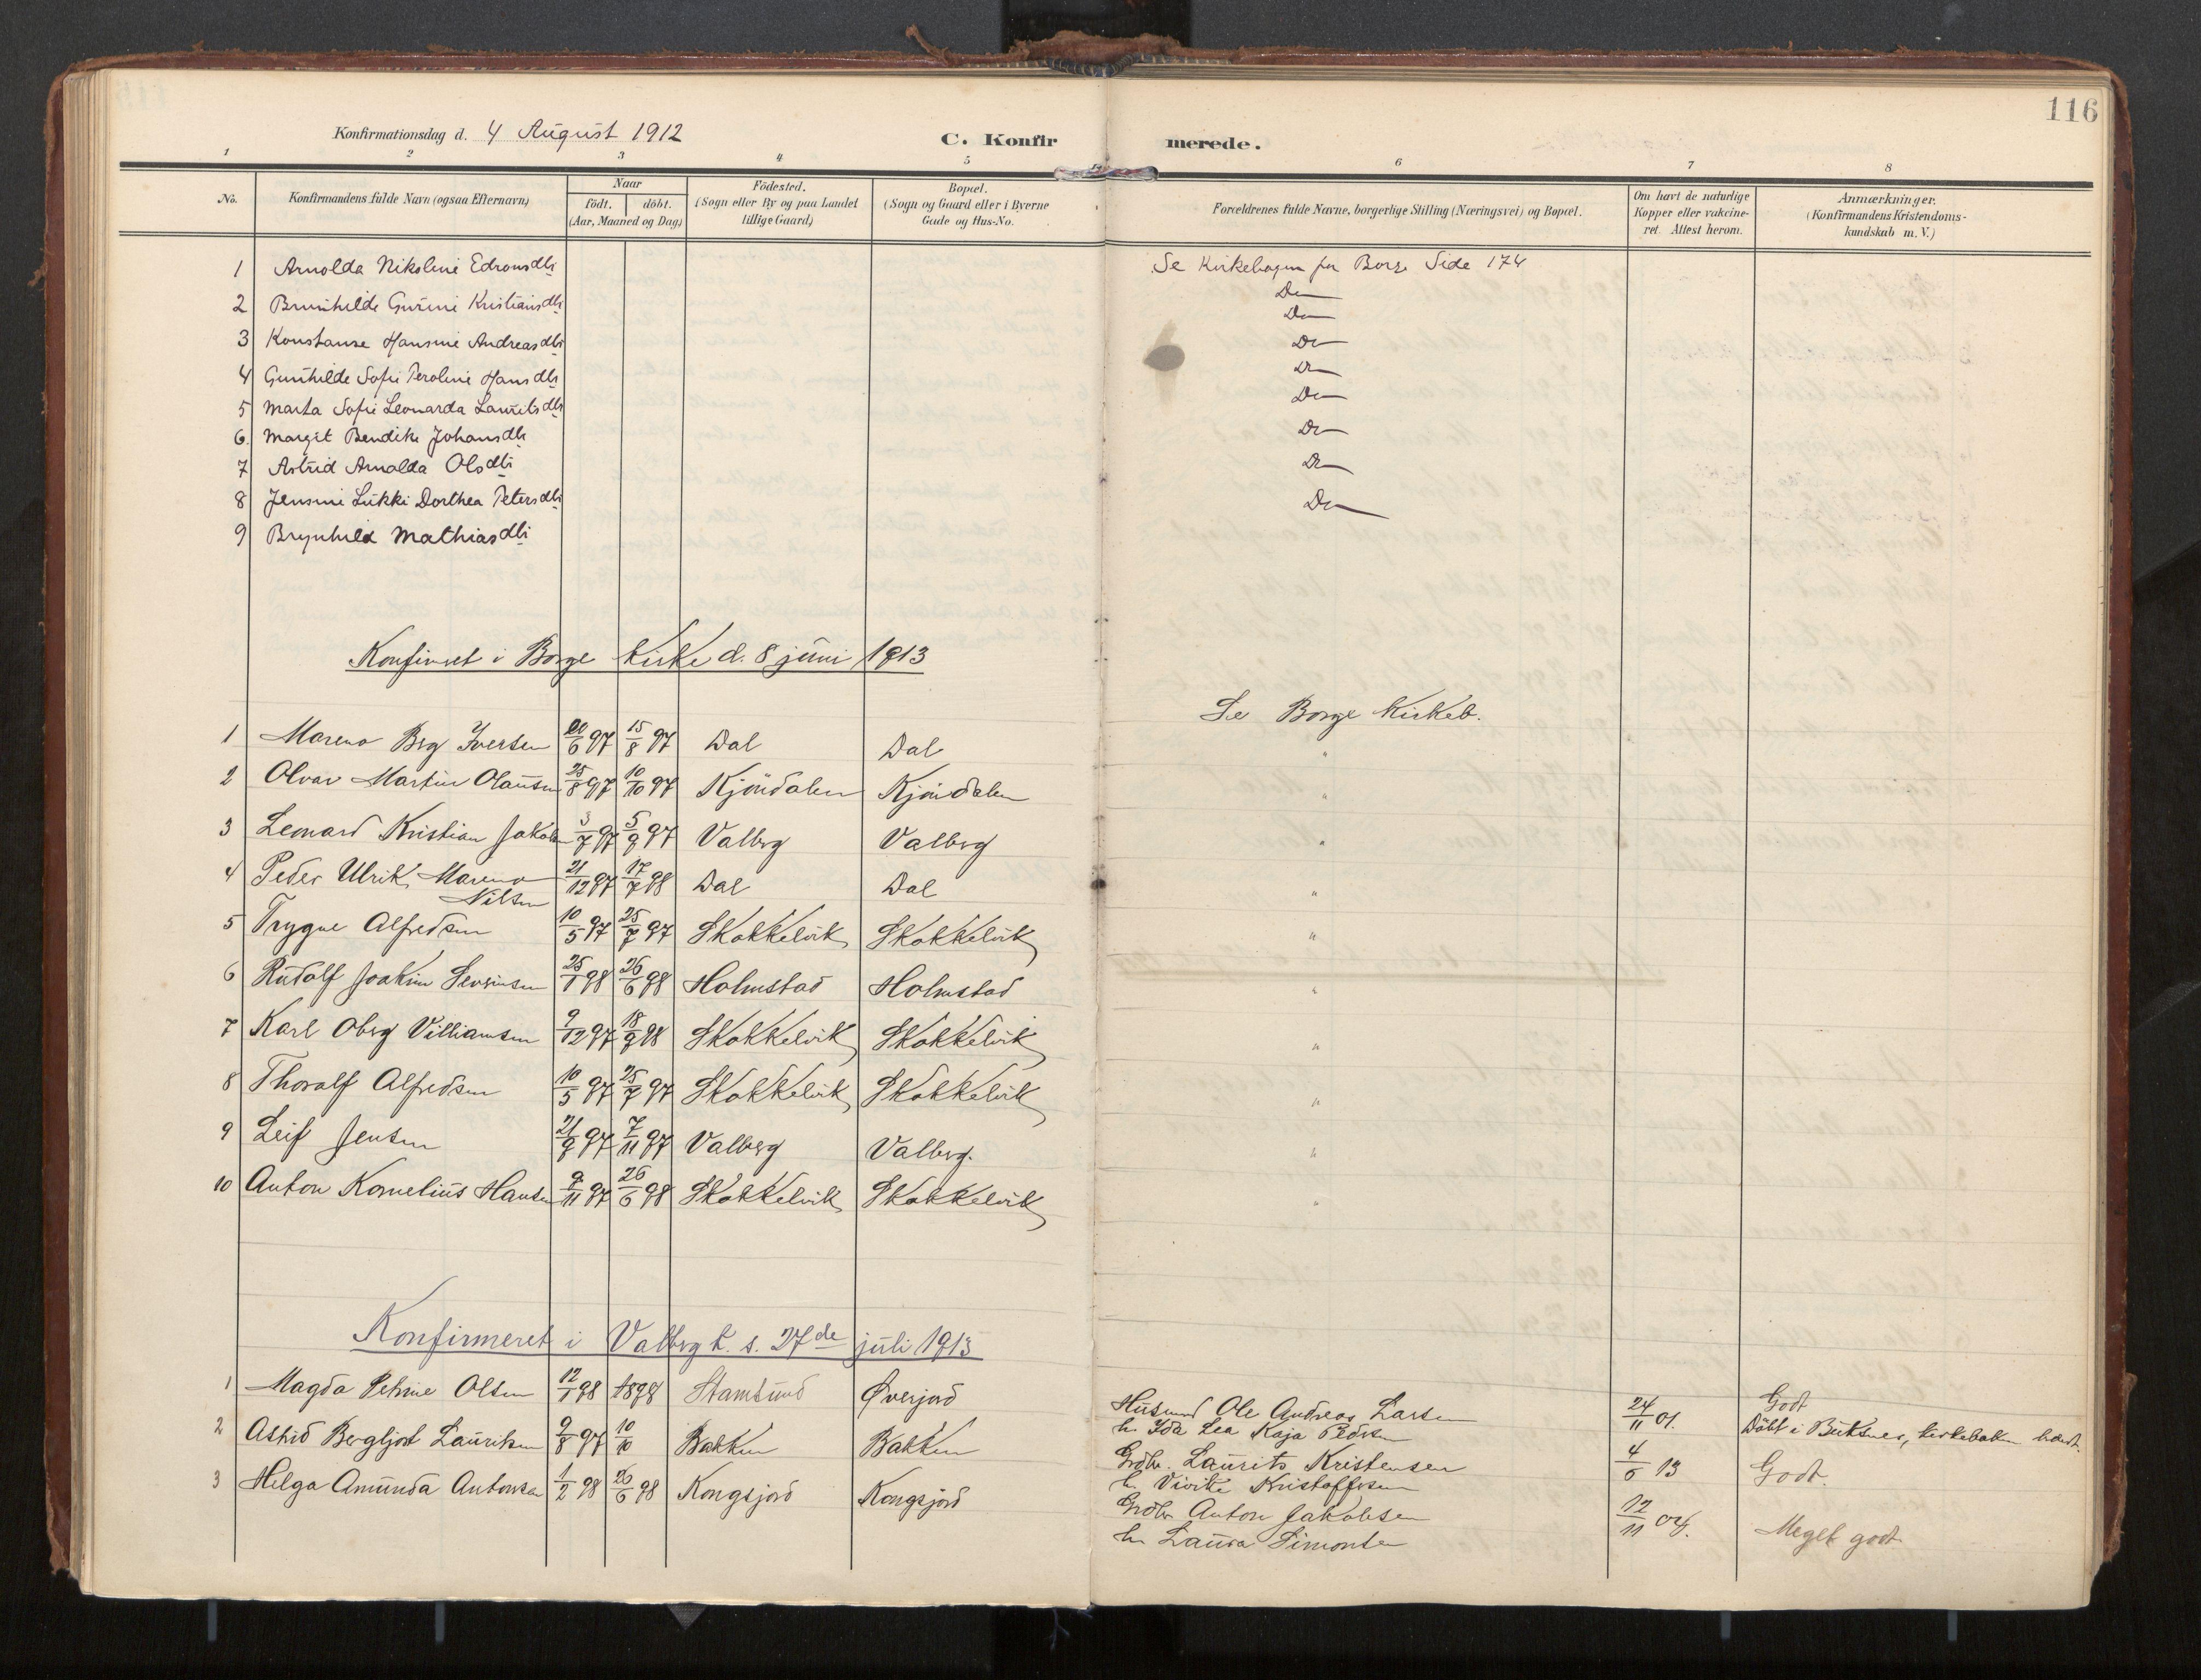 SAT, Ministerialprotokoller, klokkerbøker og fødselsregistre - Nordland, 884/L1194: Ministerialbok nr. 884A02, 1906-1937, s. 116